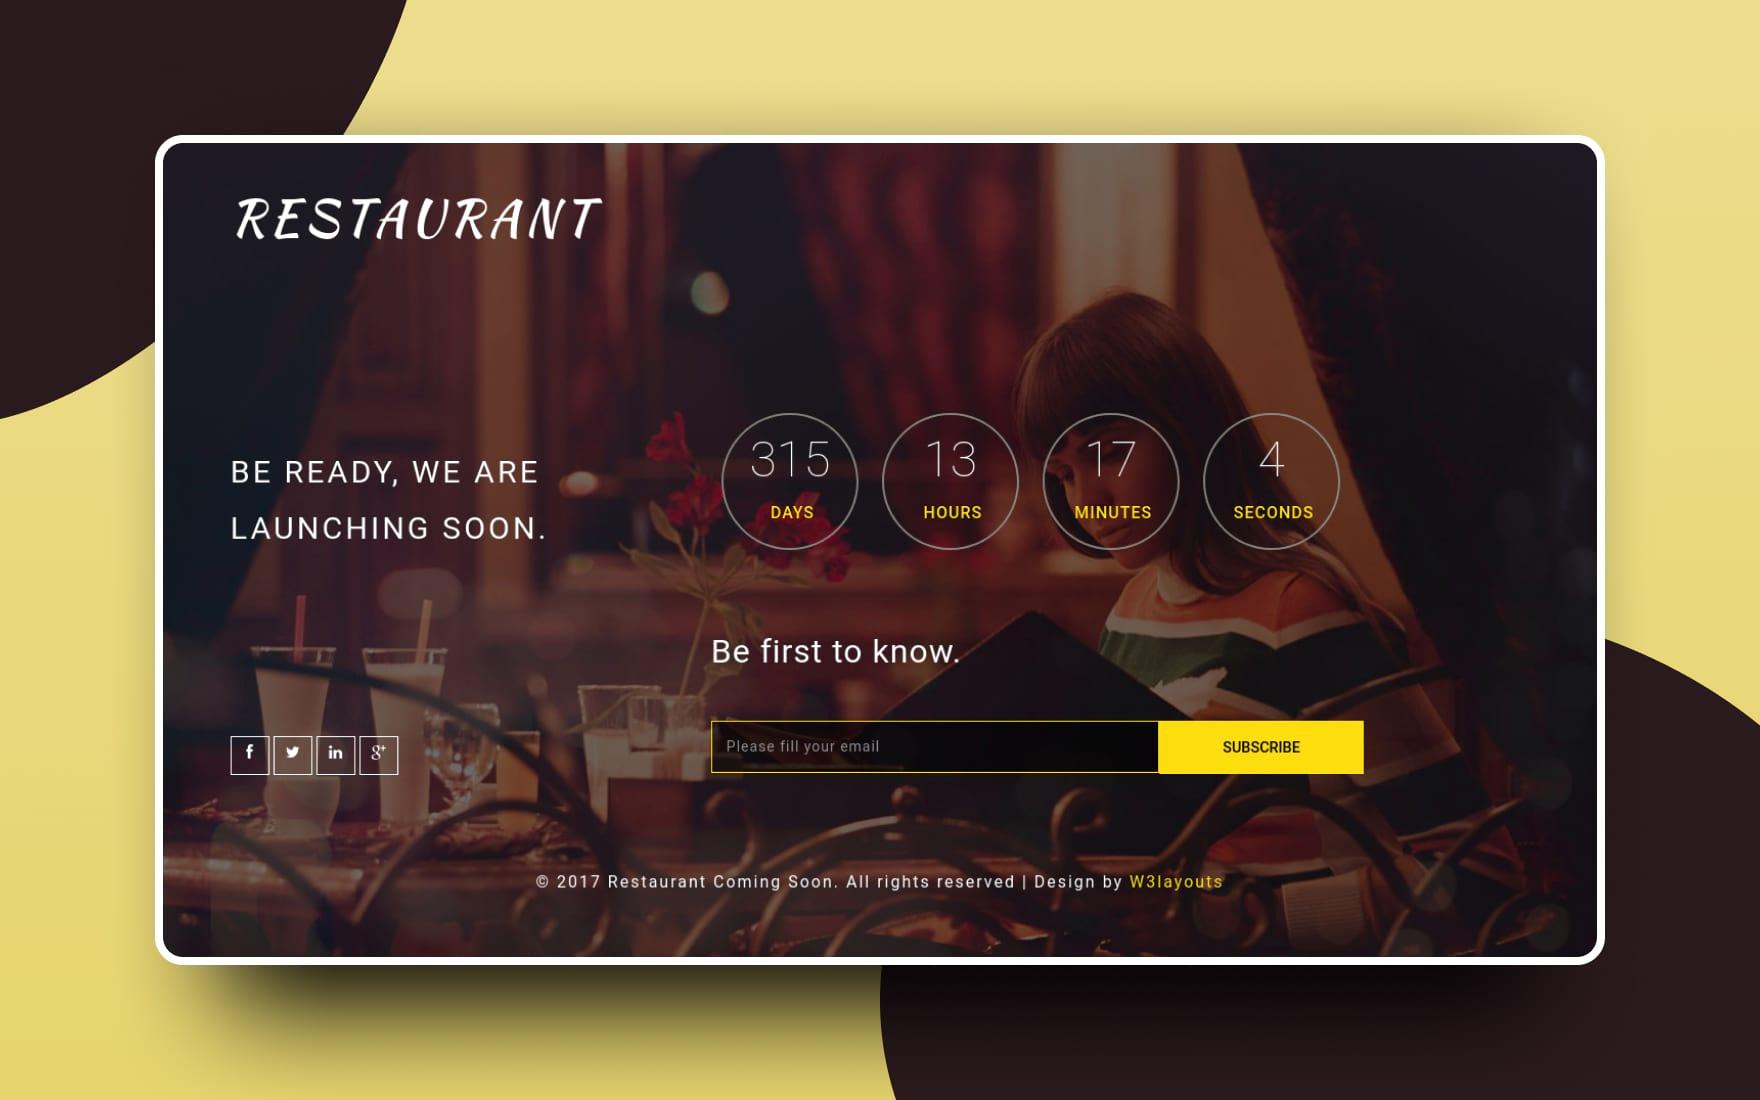 Restaurant Coming Soon a Flat Responsive Widget Template